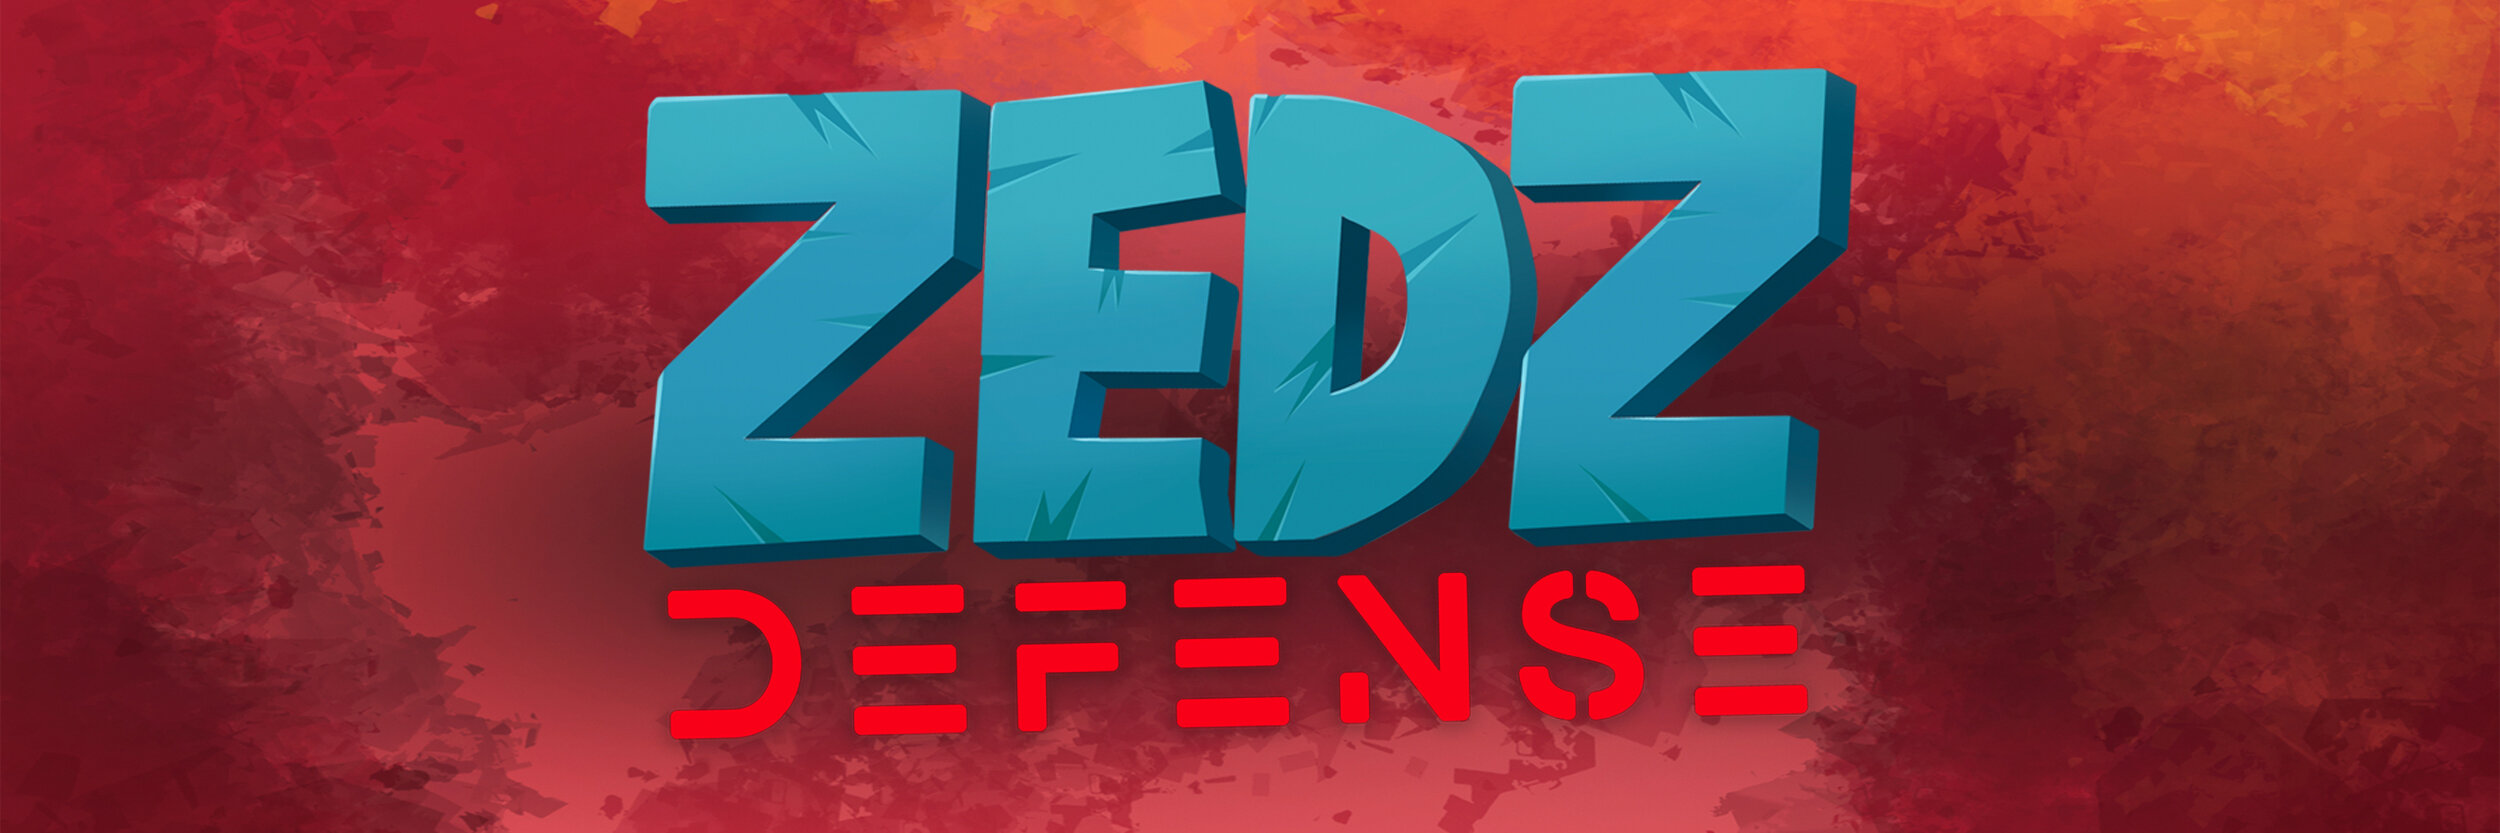 ZEDZ:Defense (PC) -  Coming Soon